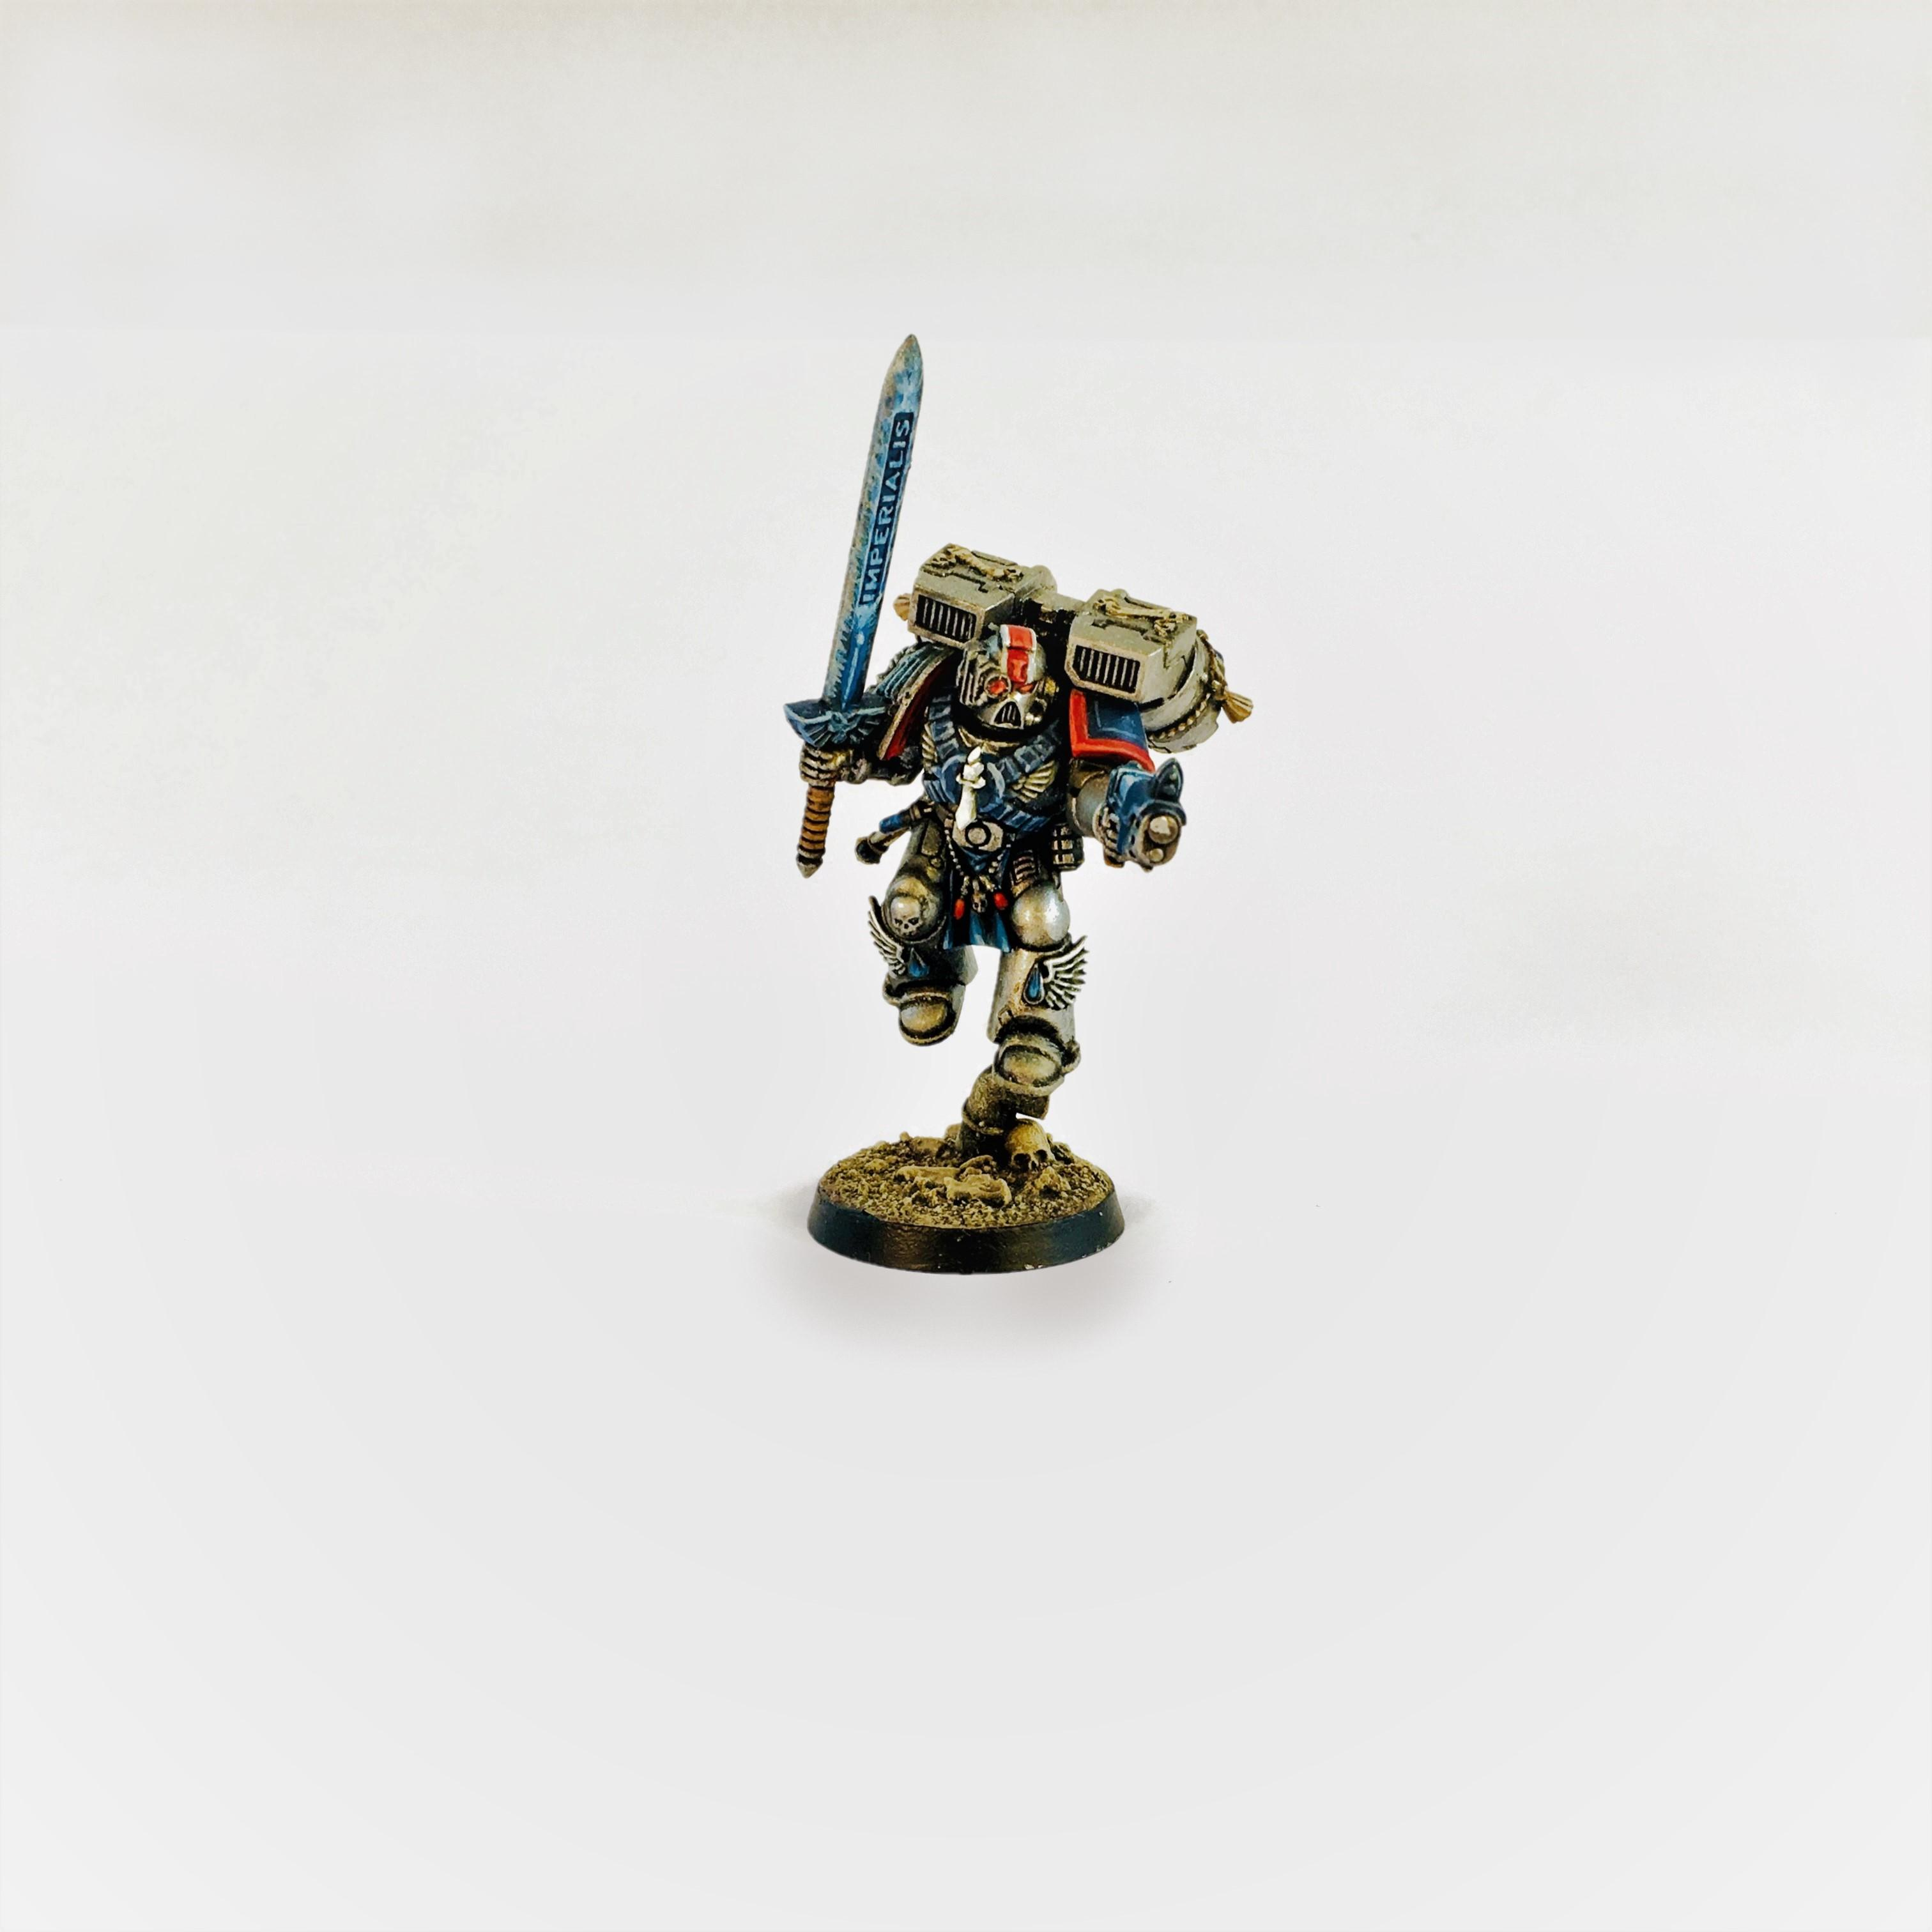 Antor Delassio, Blood Angels, Brotherhood Of The Sword, Conversion, Deathwatch, Lieutenant, Space Marines